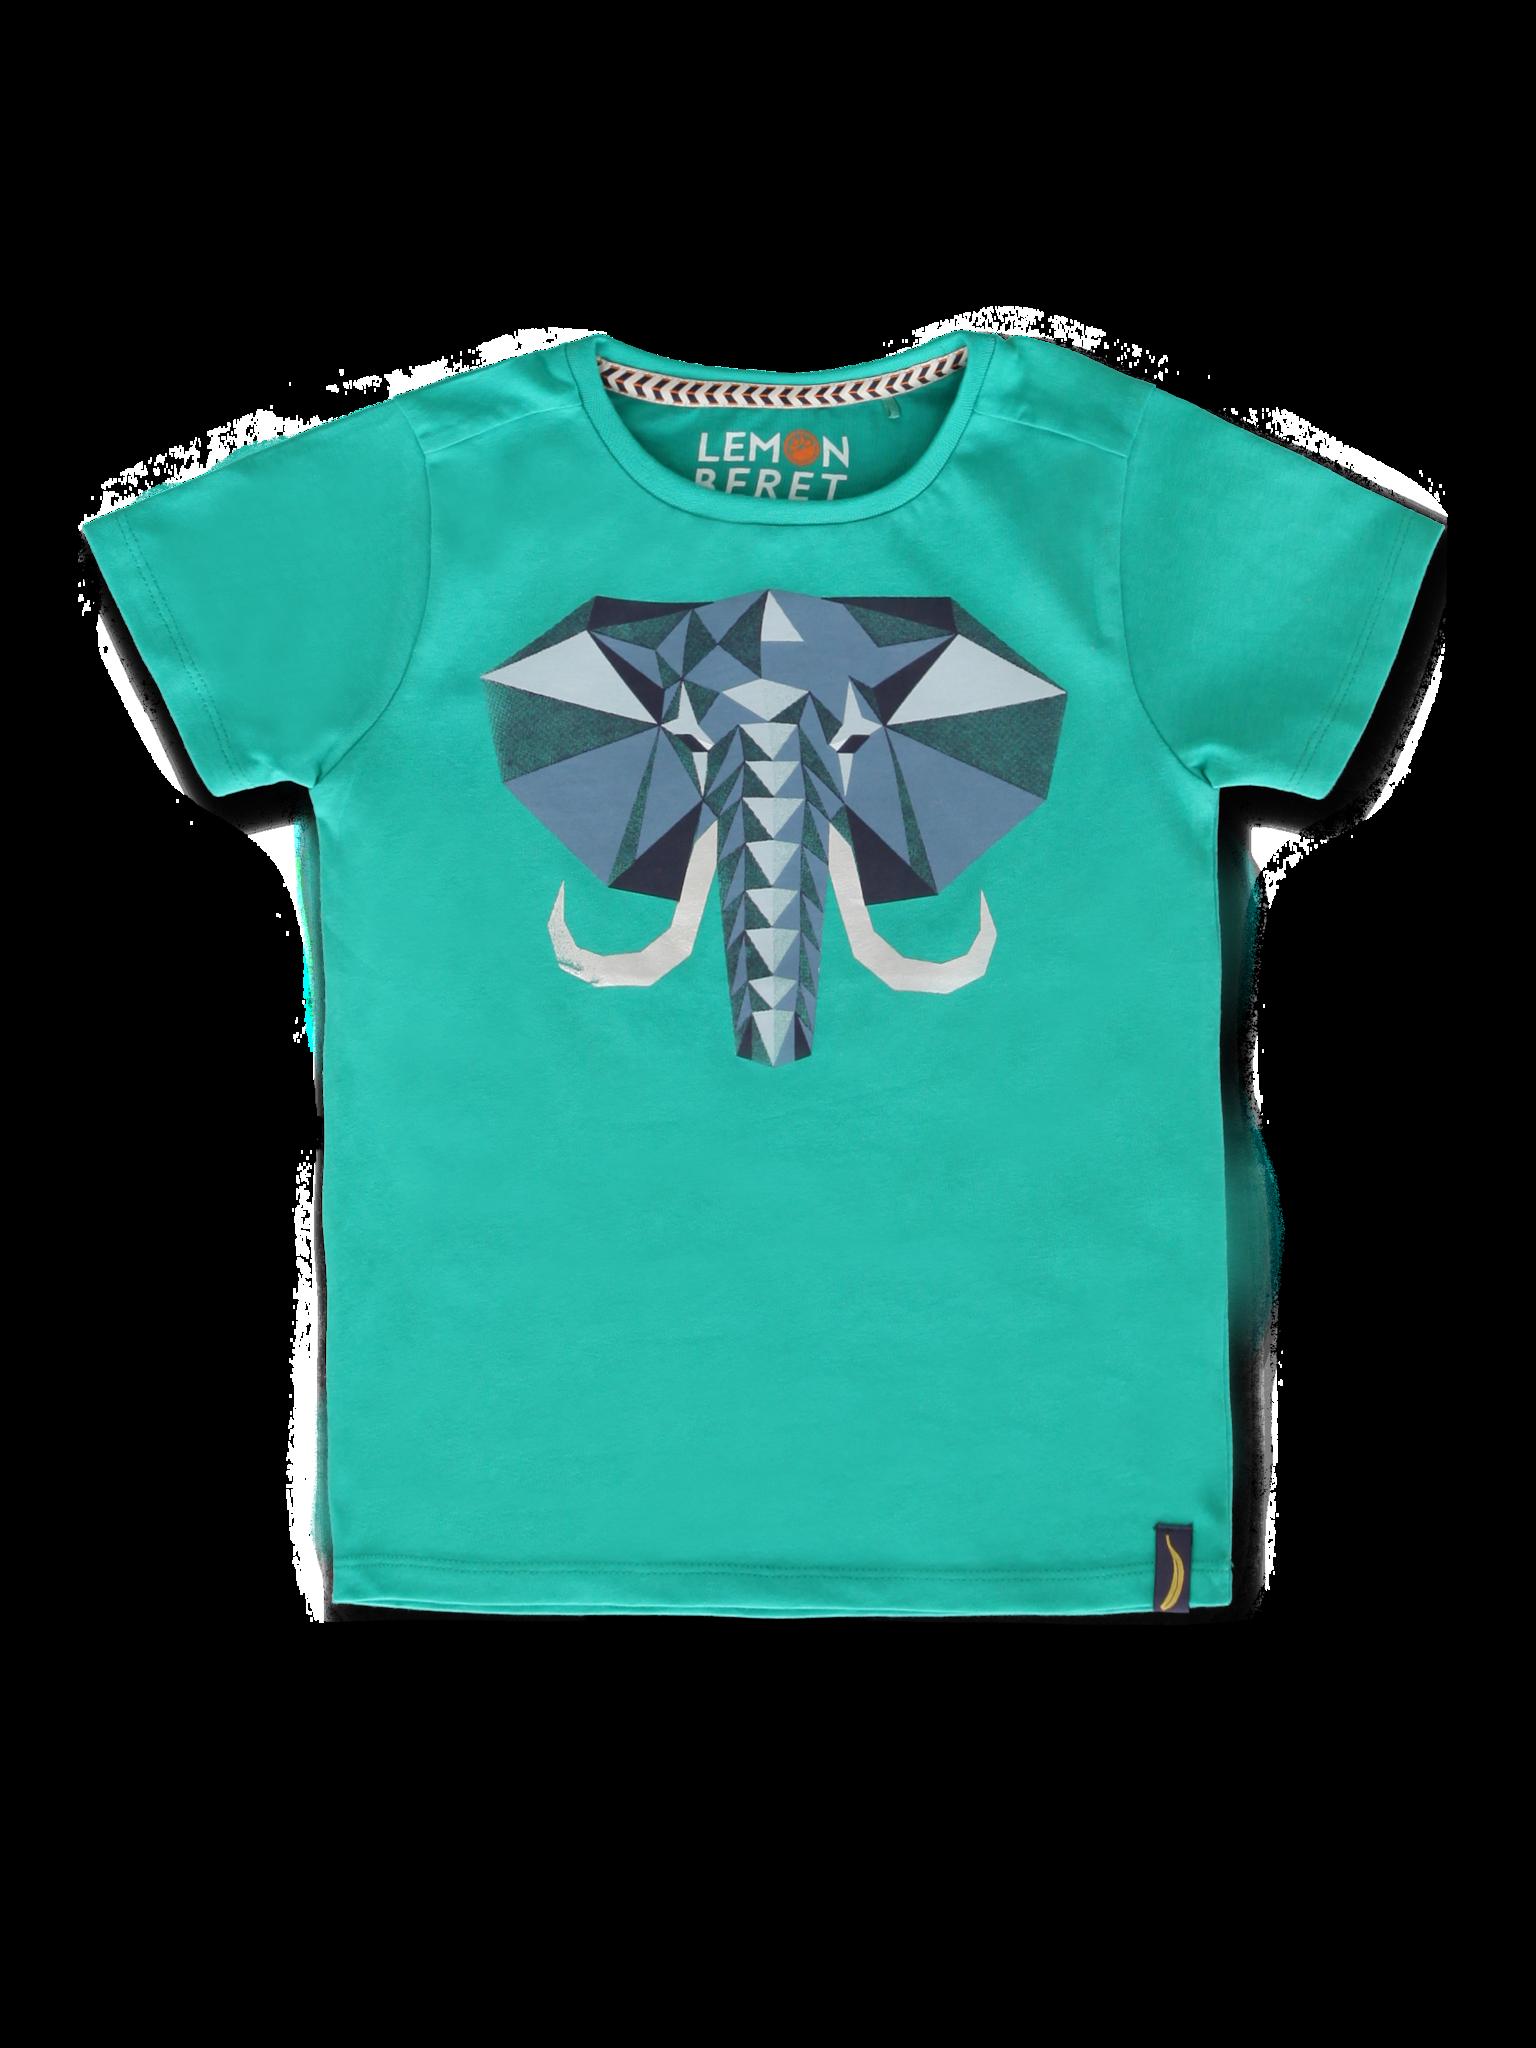 All Brands | Summerproducts Small Boys | T-shirt | 12 pcs/box